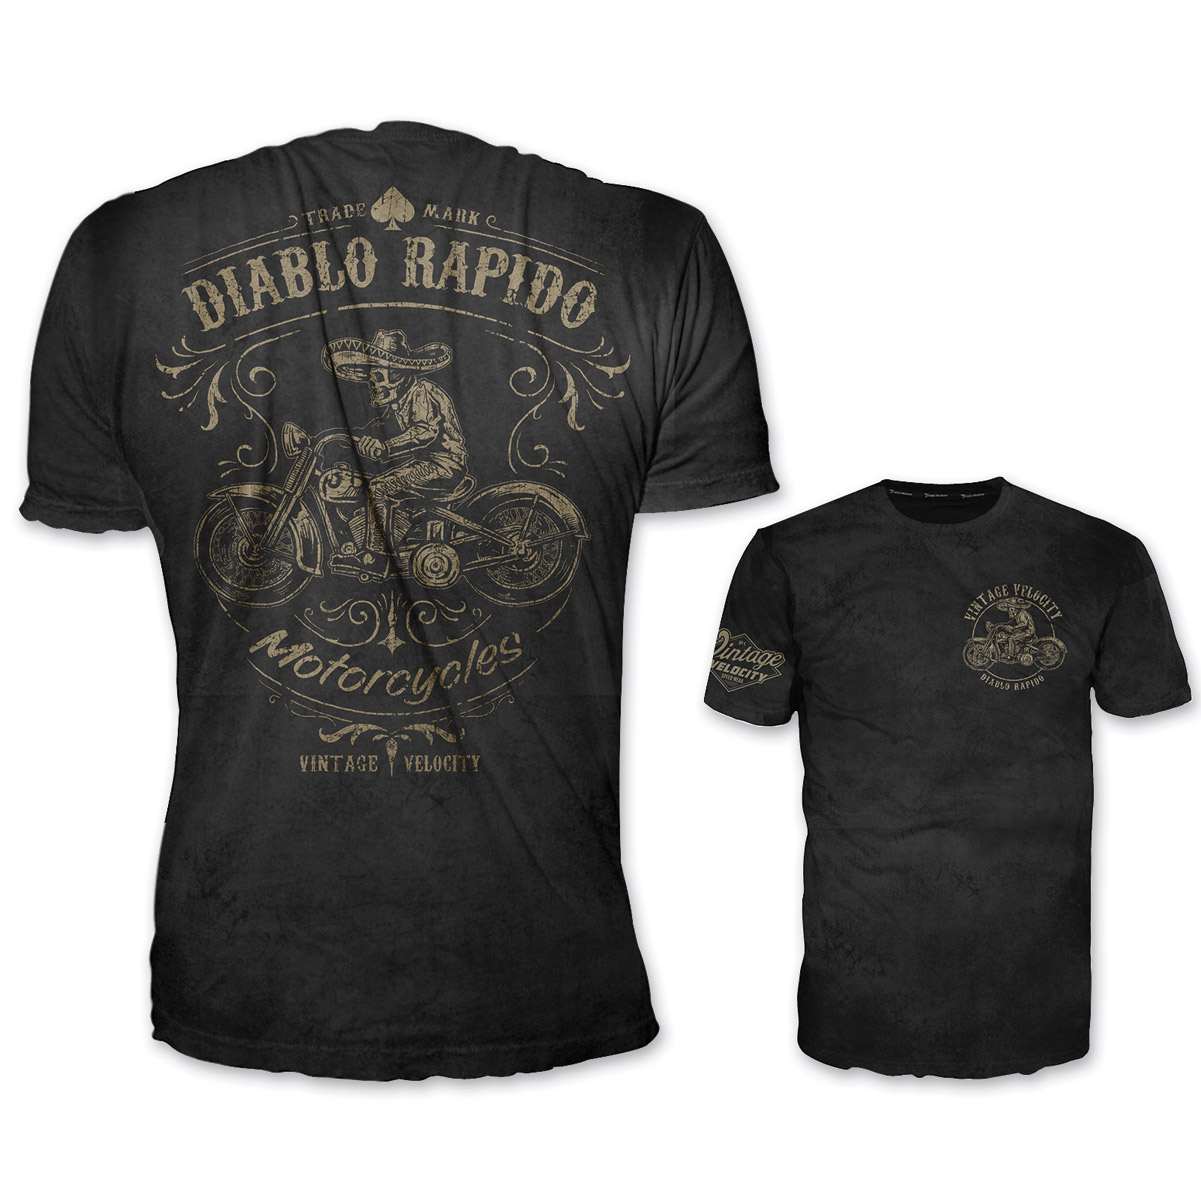 Lethal Threat Vintage Velocity Men's Diablo Rapido Black T-Shirt